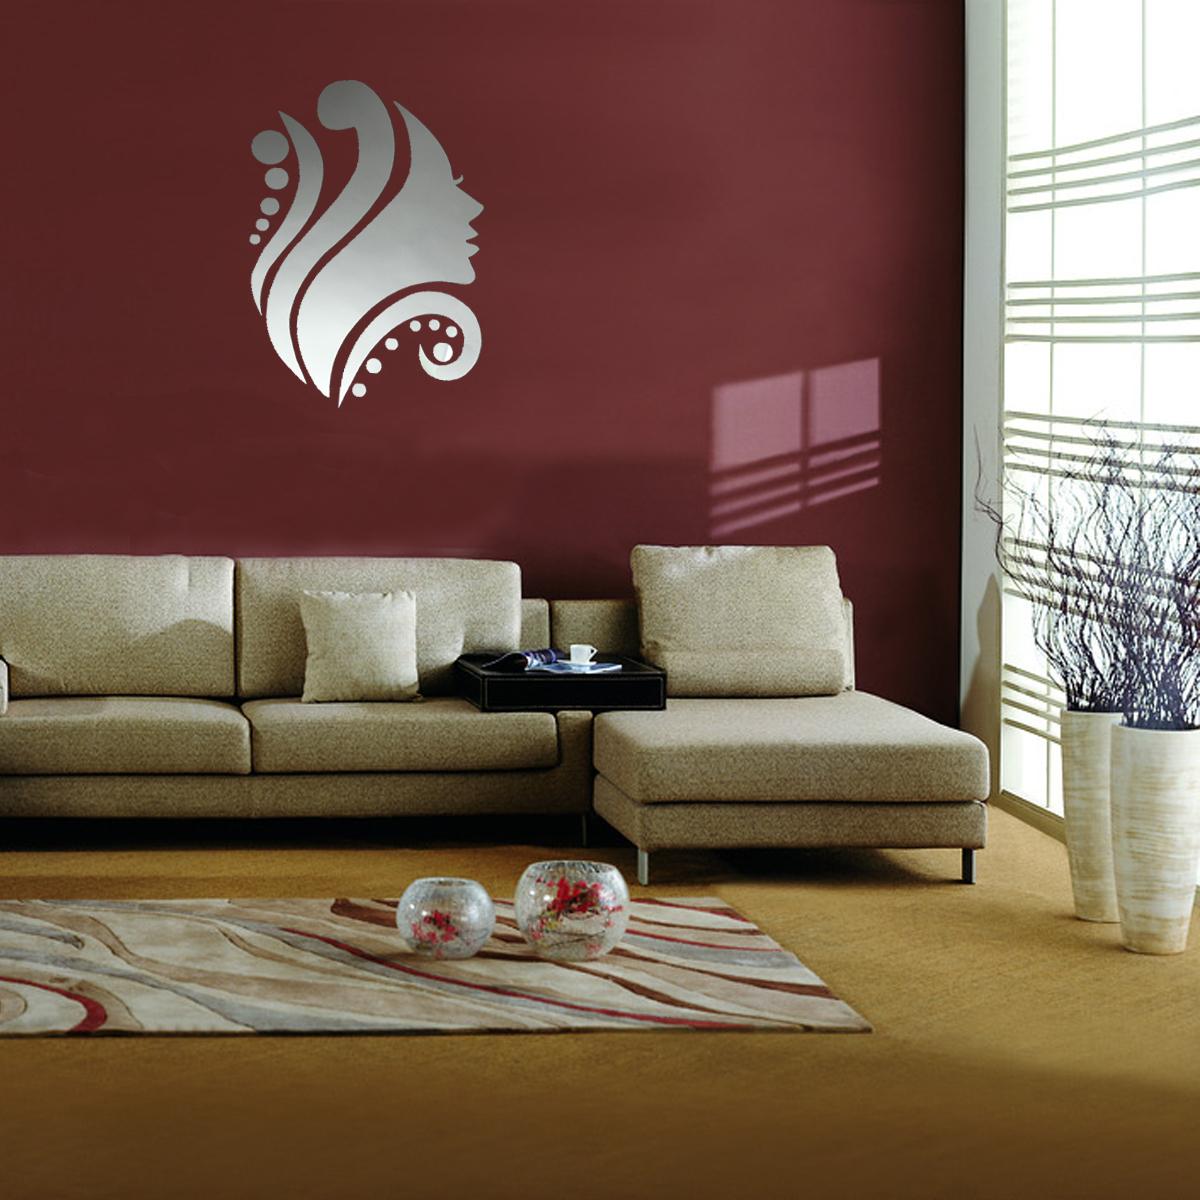 wall stickers decor modern shenra com modern 3d mirror acrylic home room office diy decor art wall